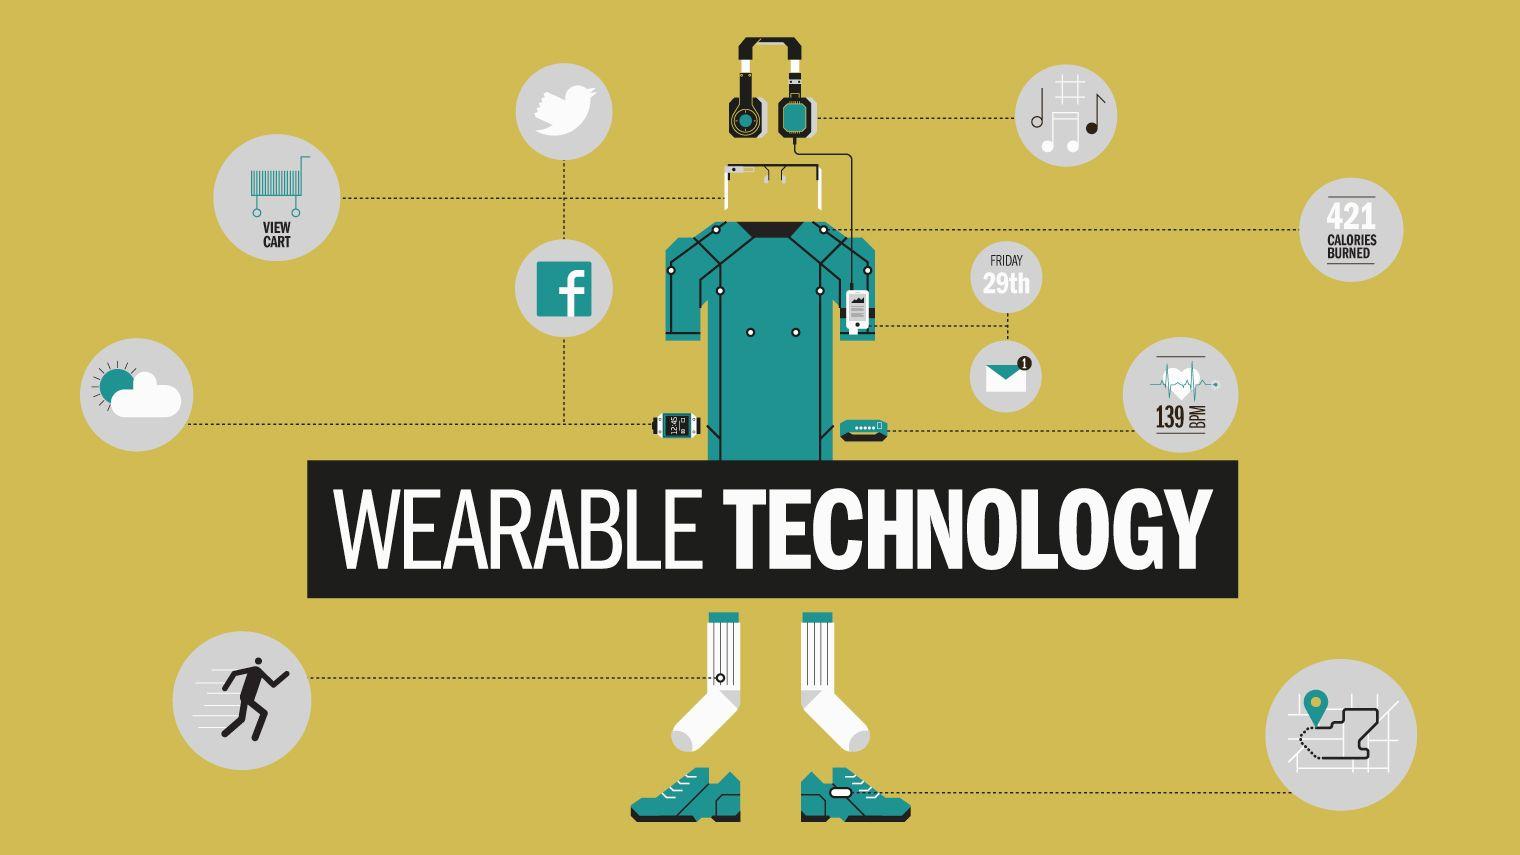 Wearable IoT technology dress